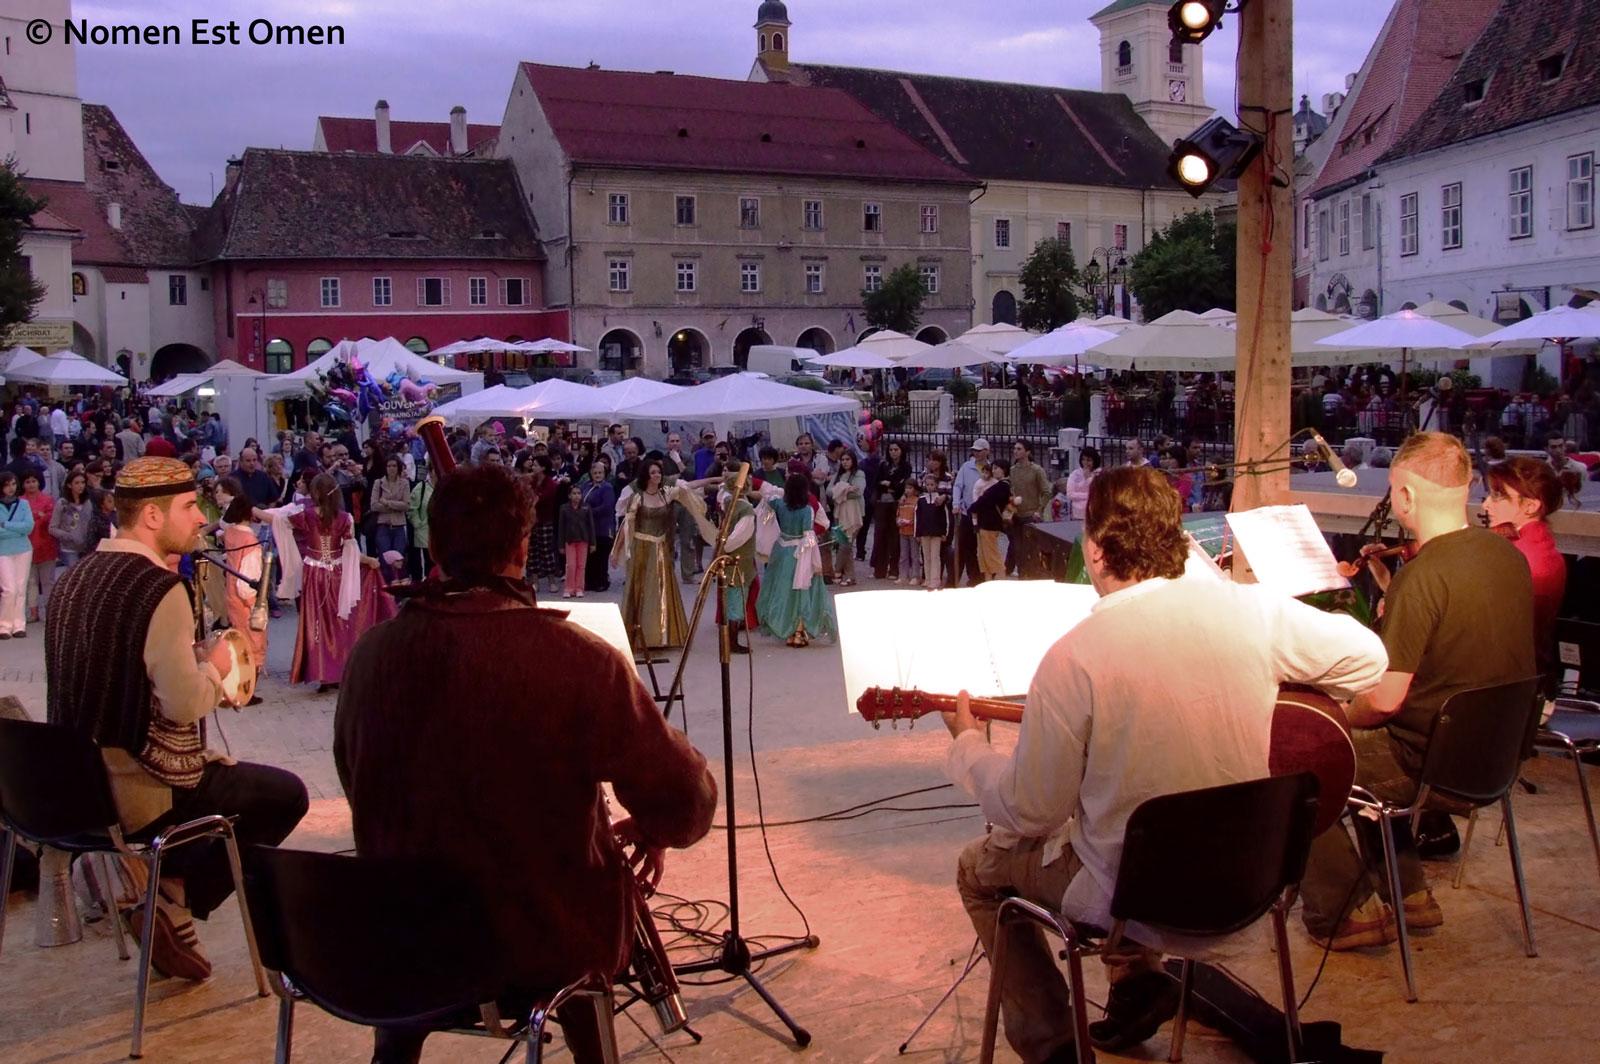 Nomen Est Omen - concert în Piata Mica din Sibiu Cetati Transilvane 2008